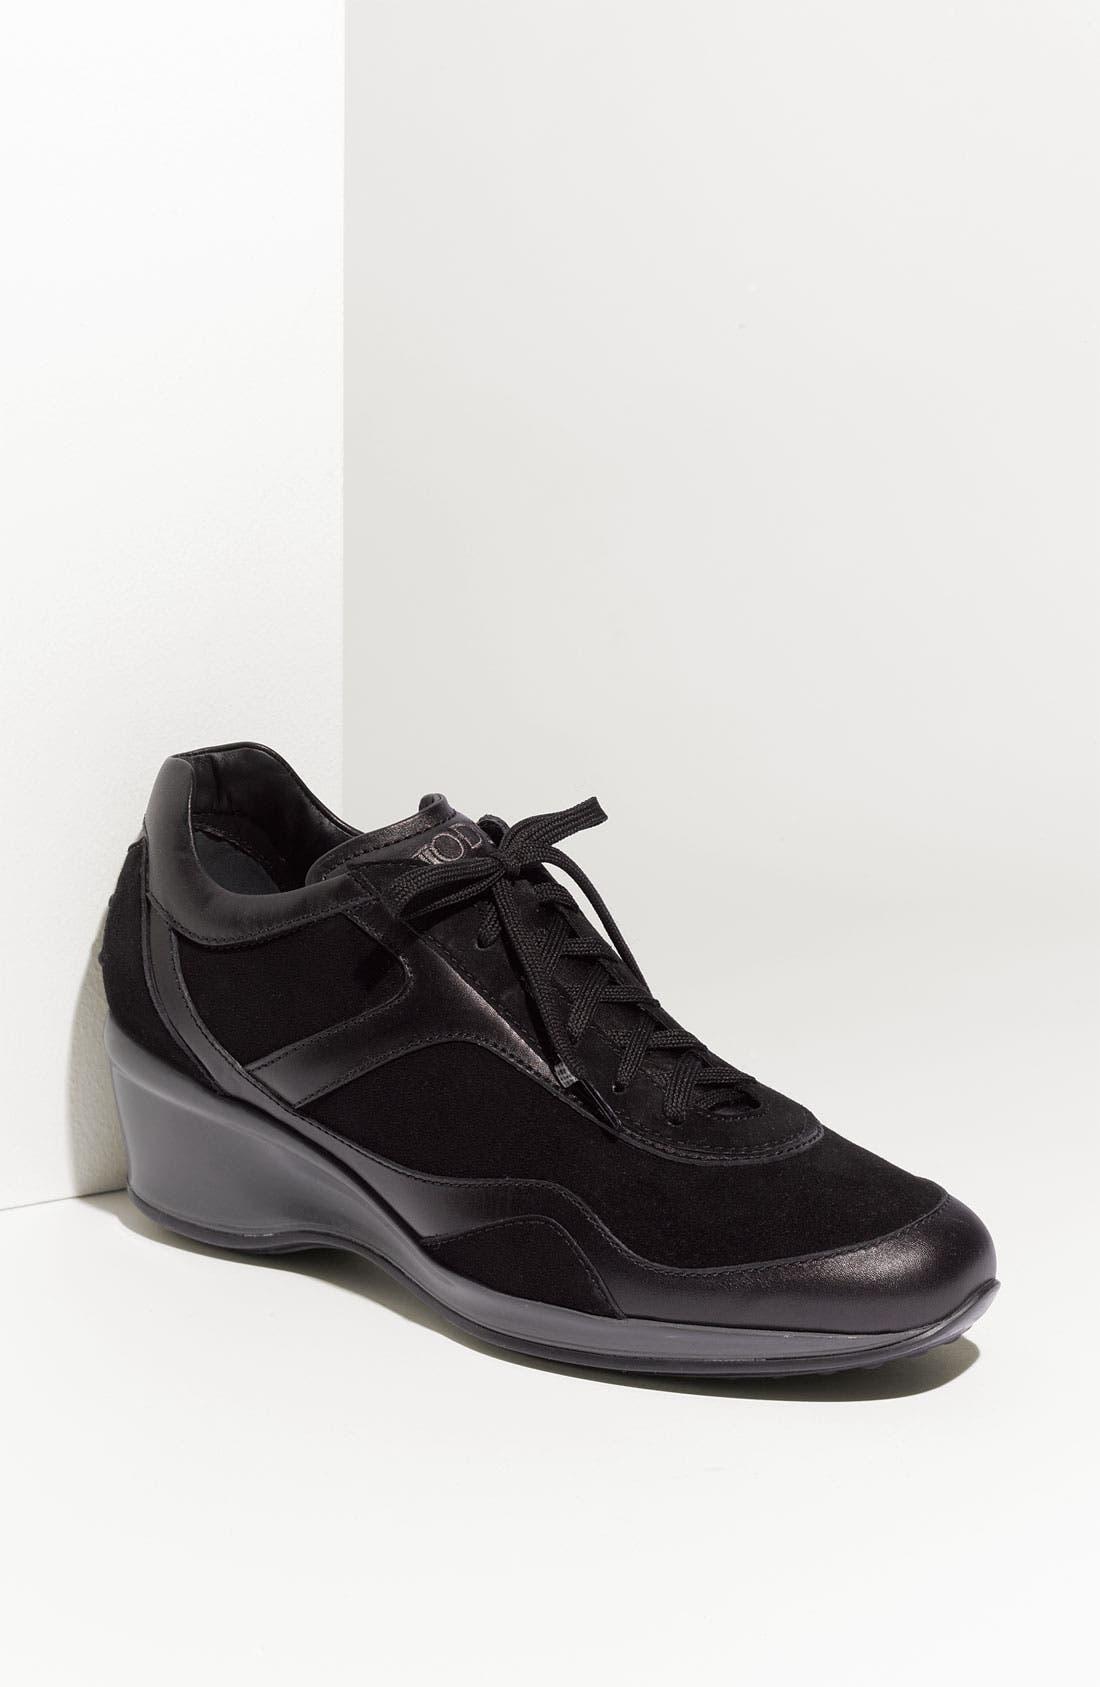 Main Image - Tod's Wedge Heel Sneaker